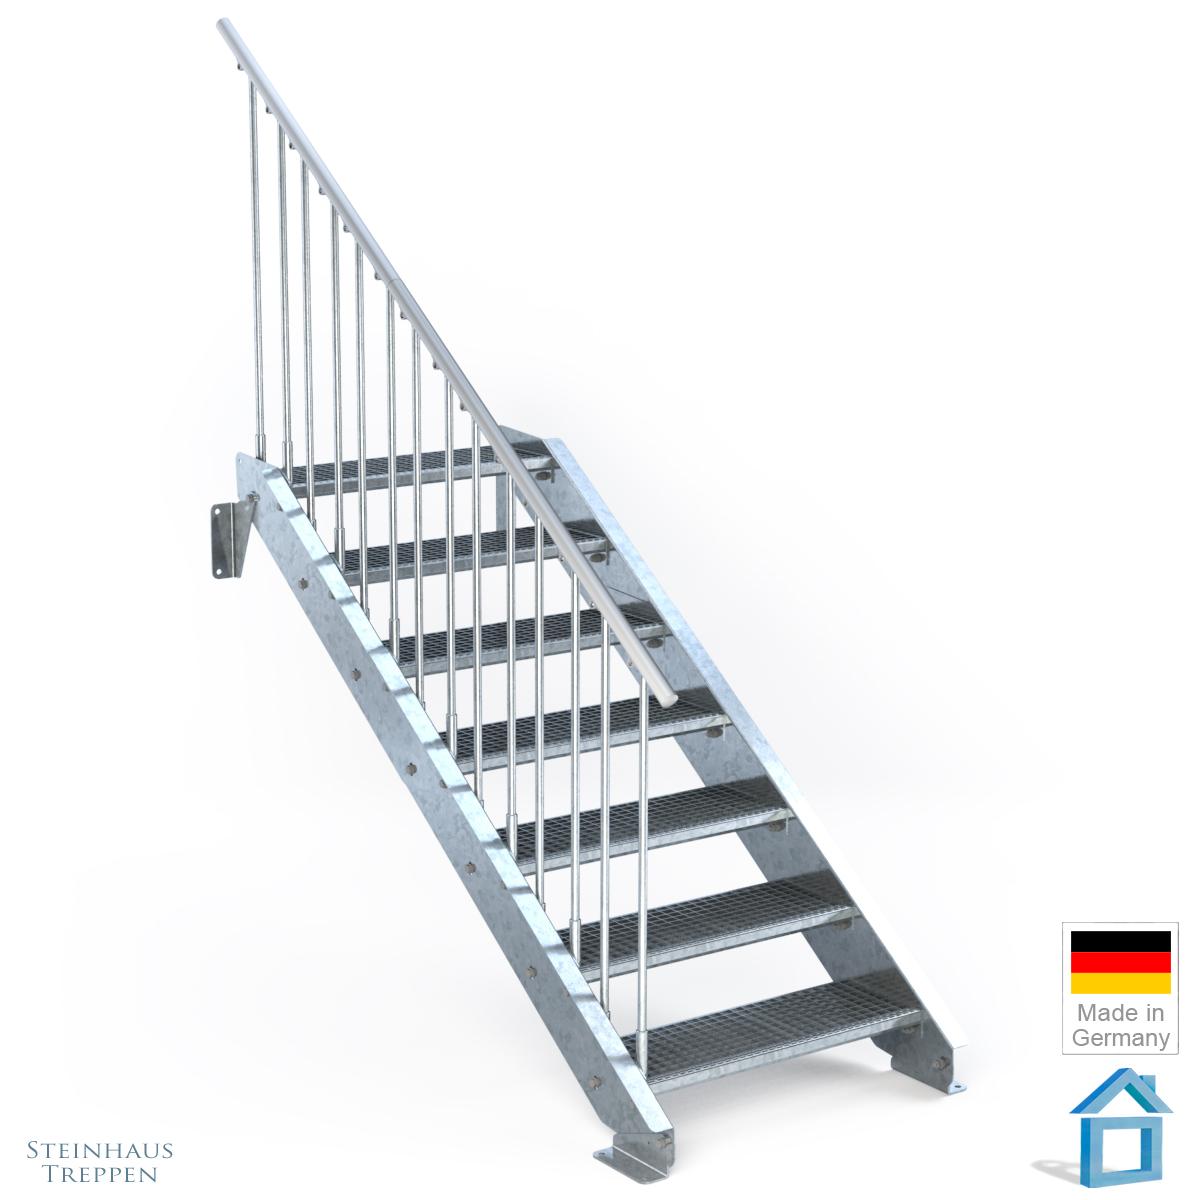 gerade au entreppen am balkon und das obere geschoss auch. Black Bedroom Furniture Sets. Home Design Ideas